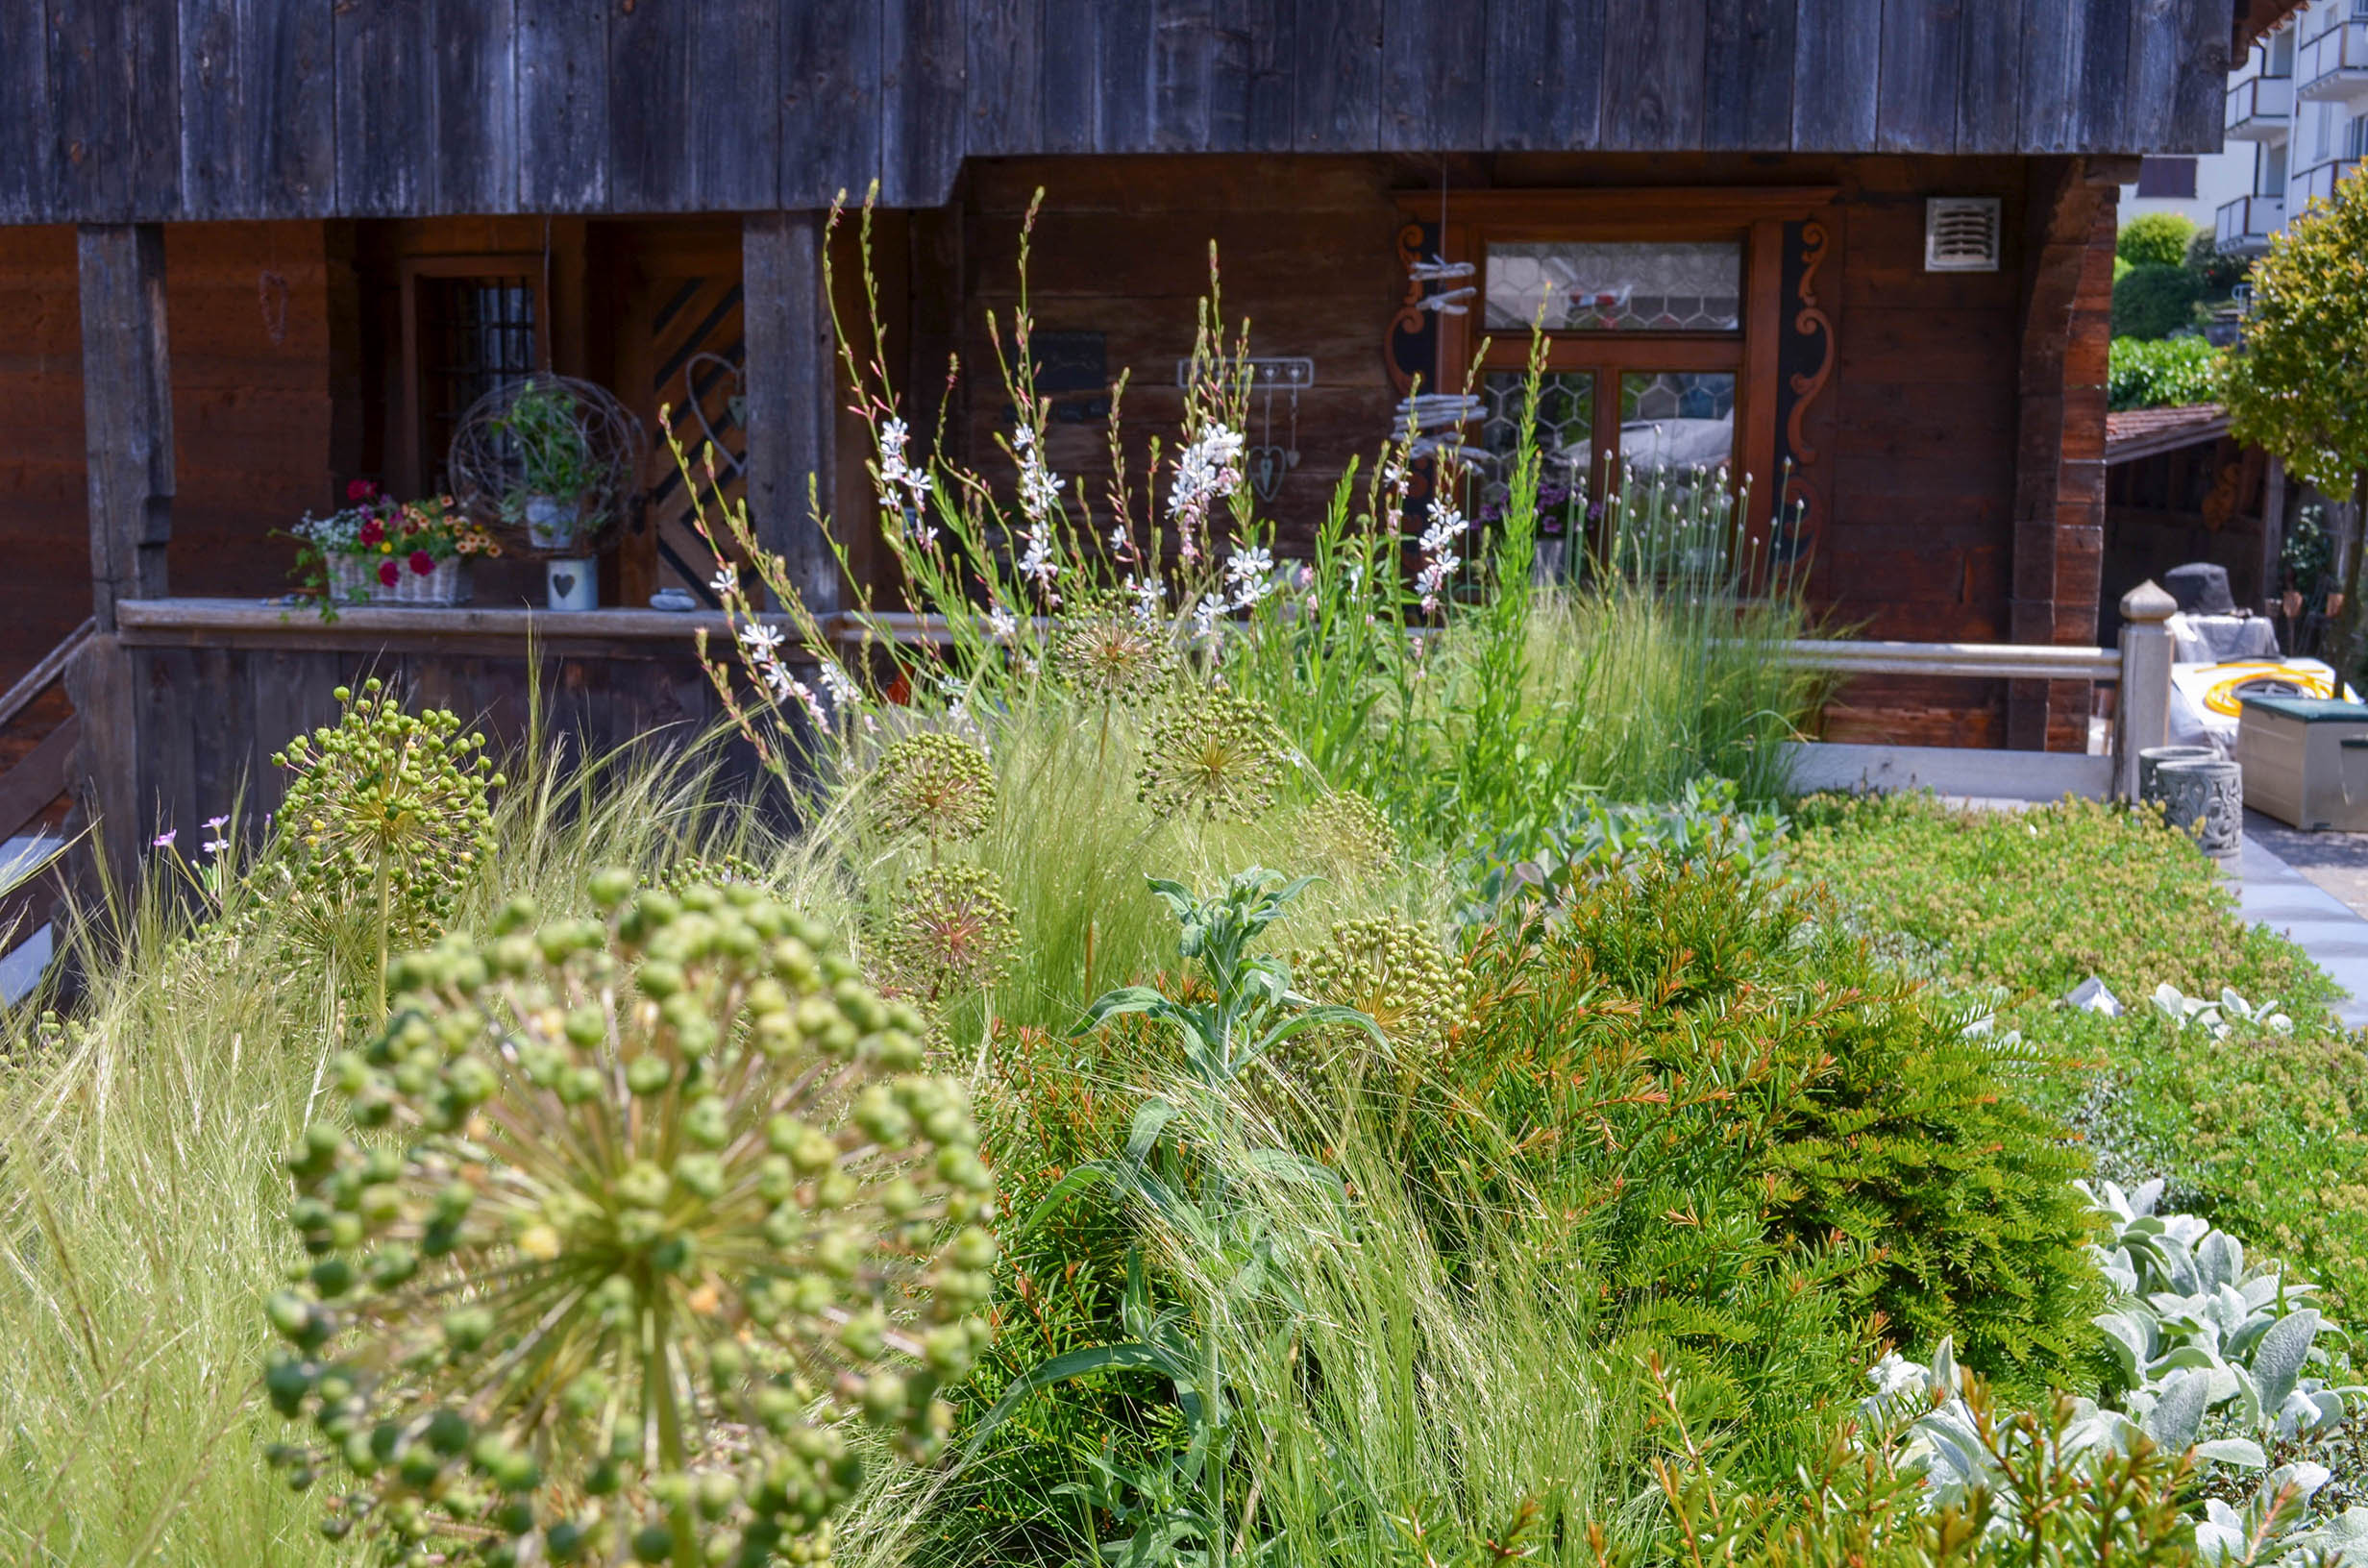 Gartenoase in Buochs 9